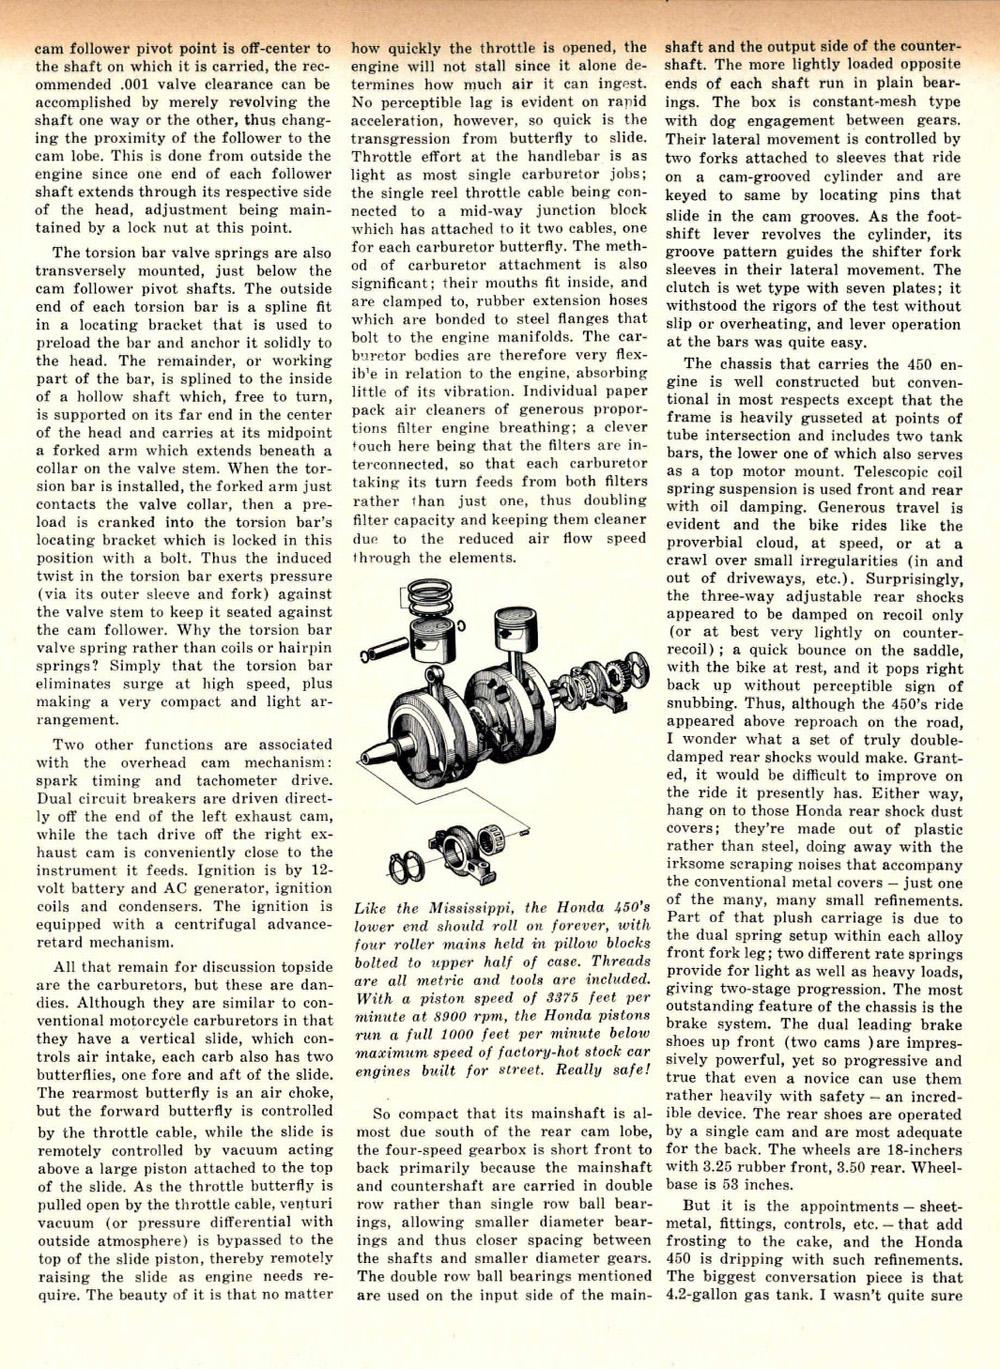 Honda 450 Engine tech article 06.jpg